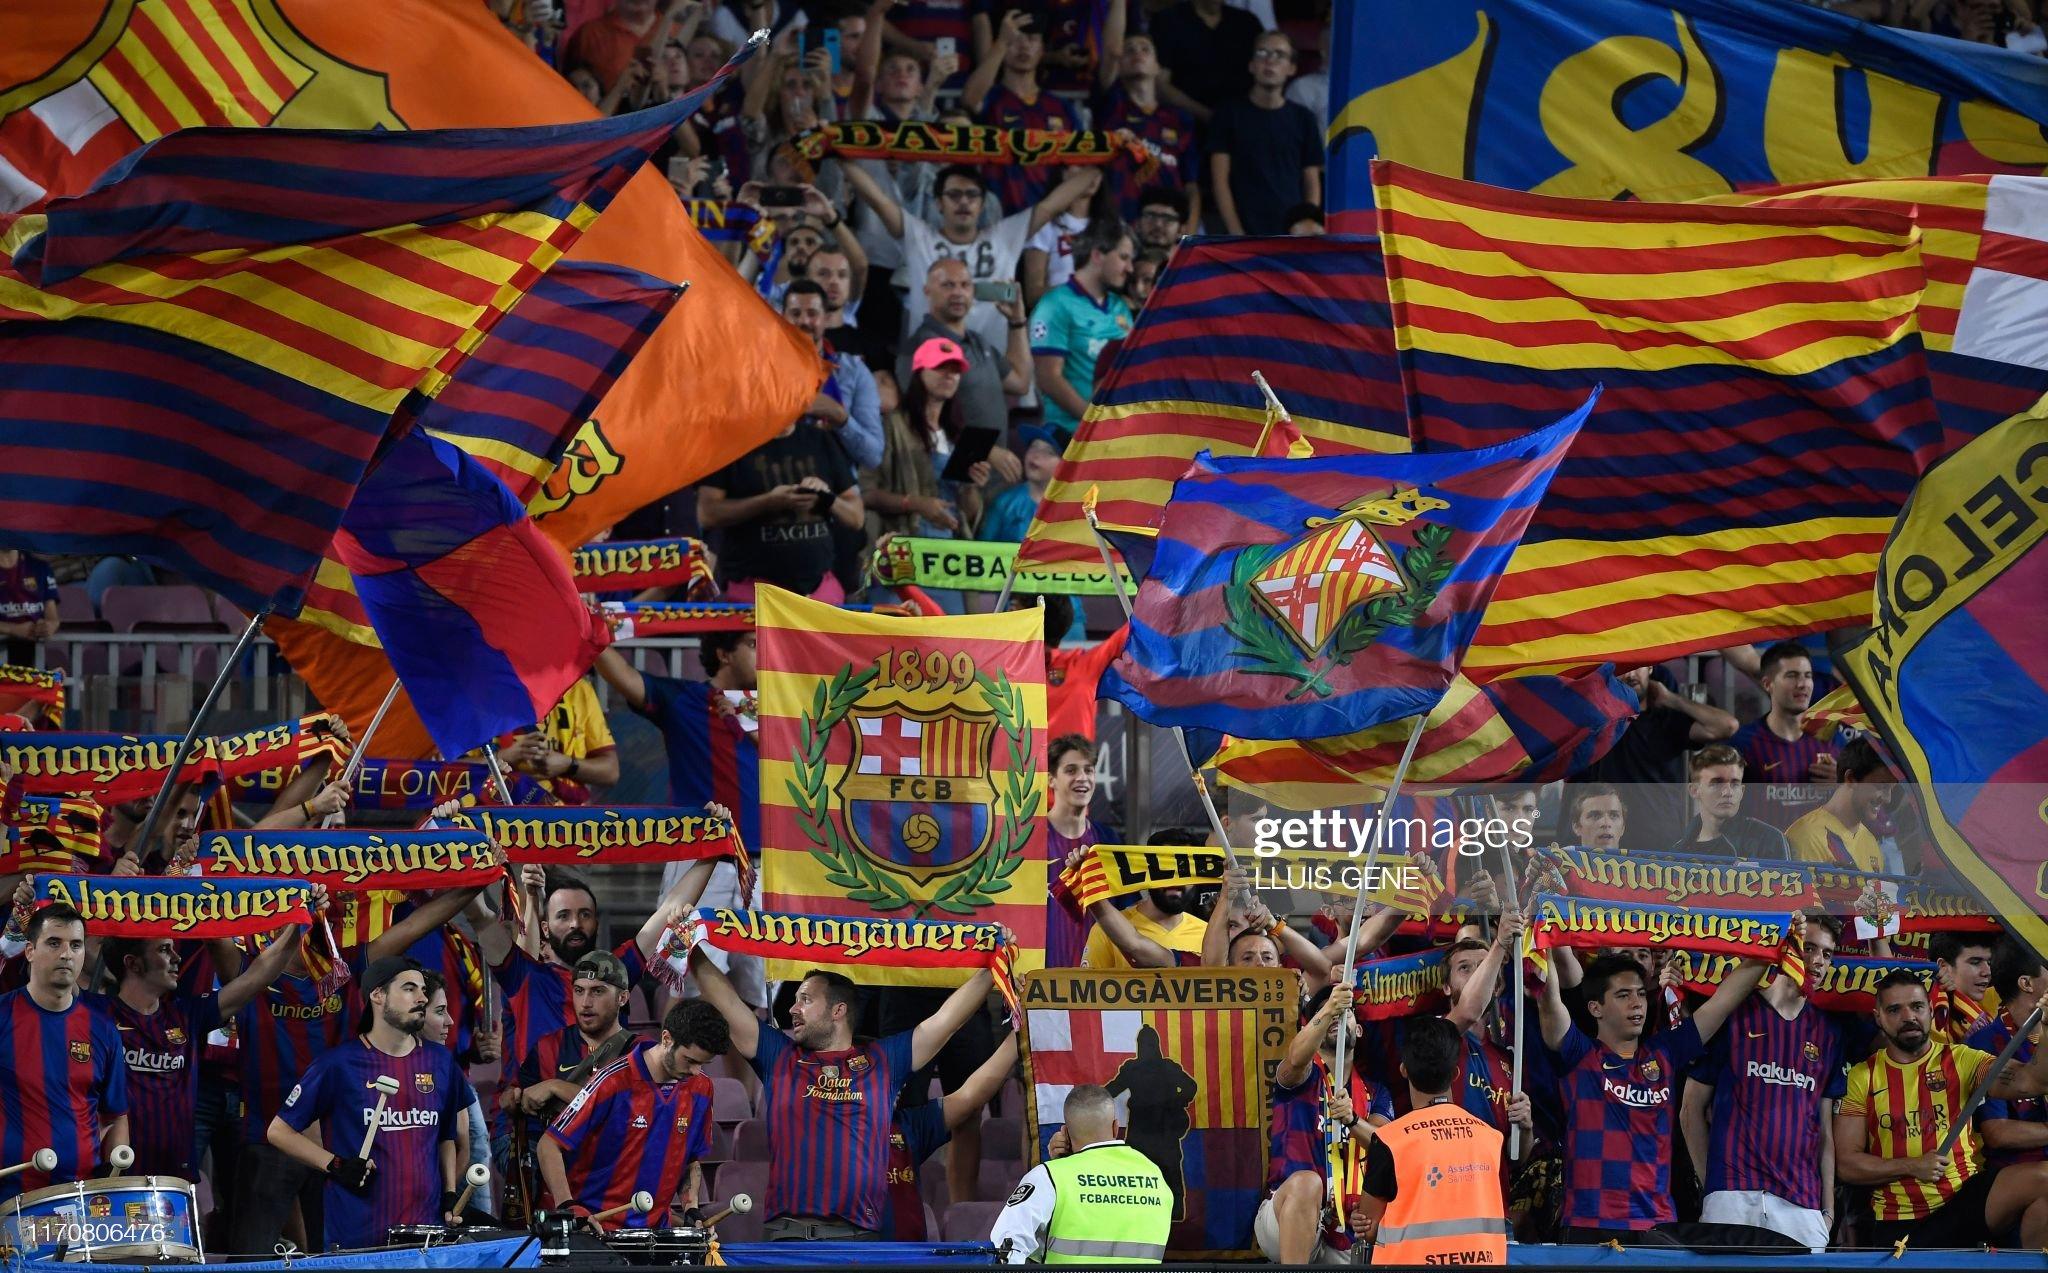 صور مباراة : برشلونة - فياريال 2-1 ( 24-09-2019 )  Barcelonas-fans-wave-teams-flags-and-cheer-from-the-stands-during-the-picture-id1170806476?s=2048x2048